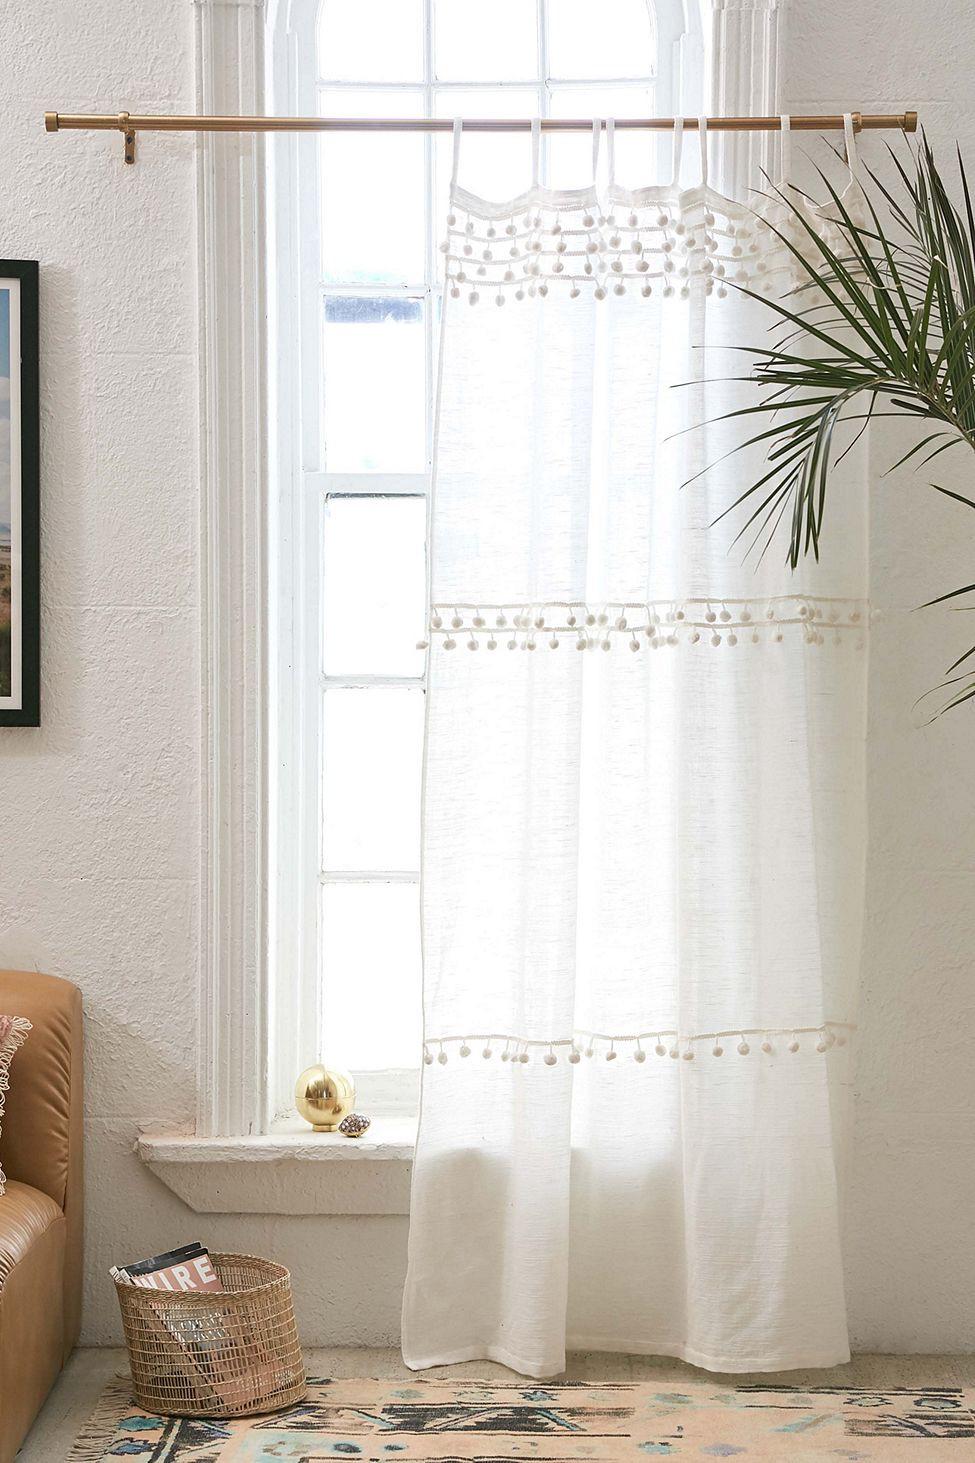 Averi pompom gauze window curtain by urban outfitters in